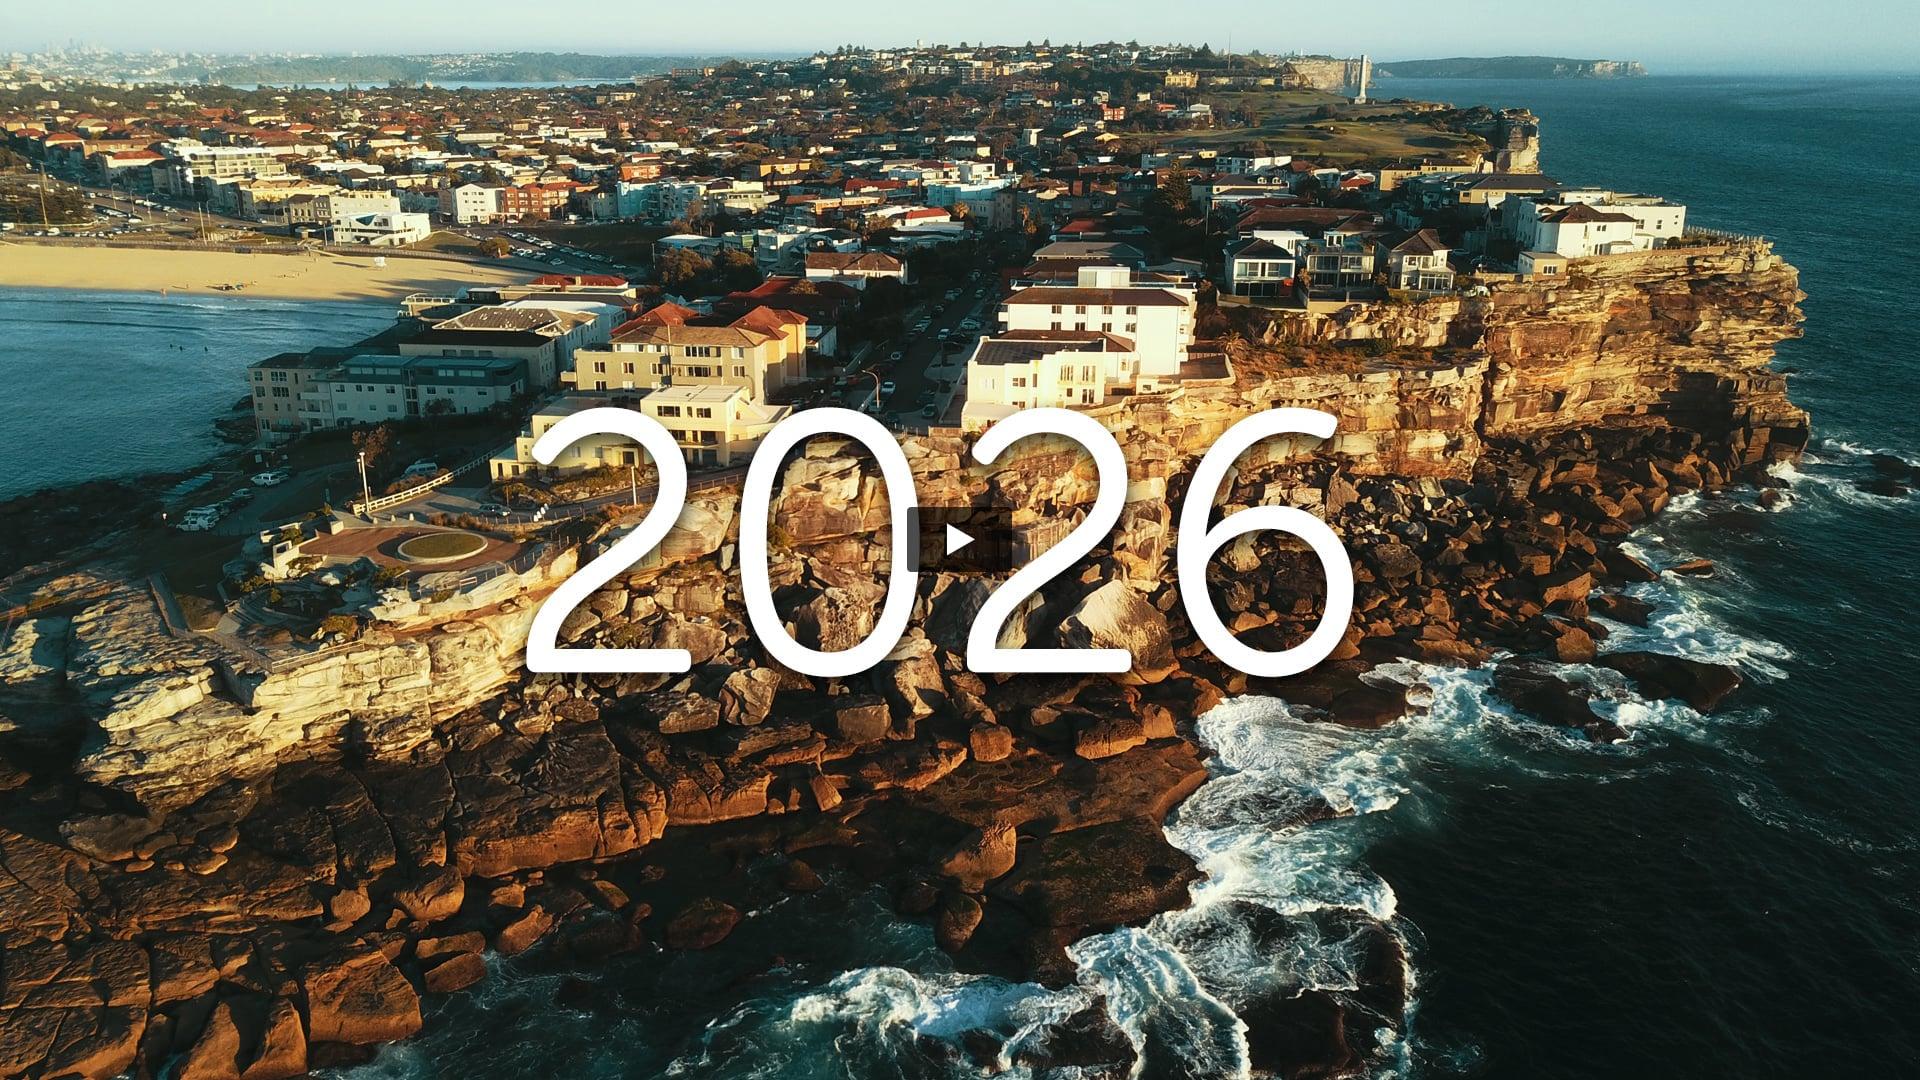 2026 - Nov 2017